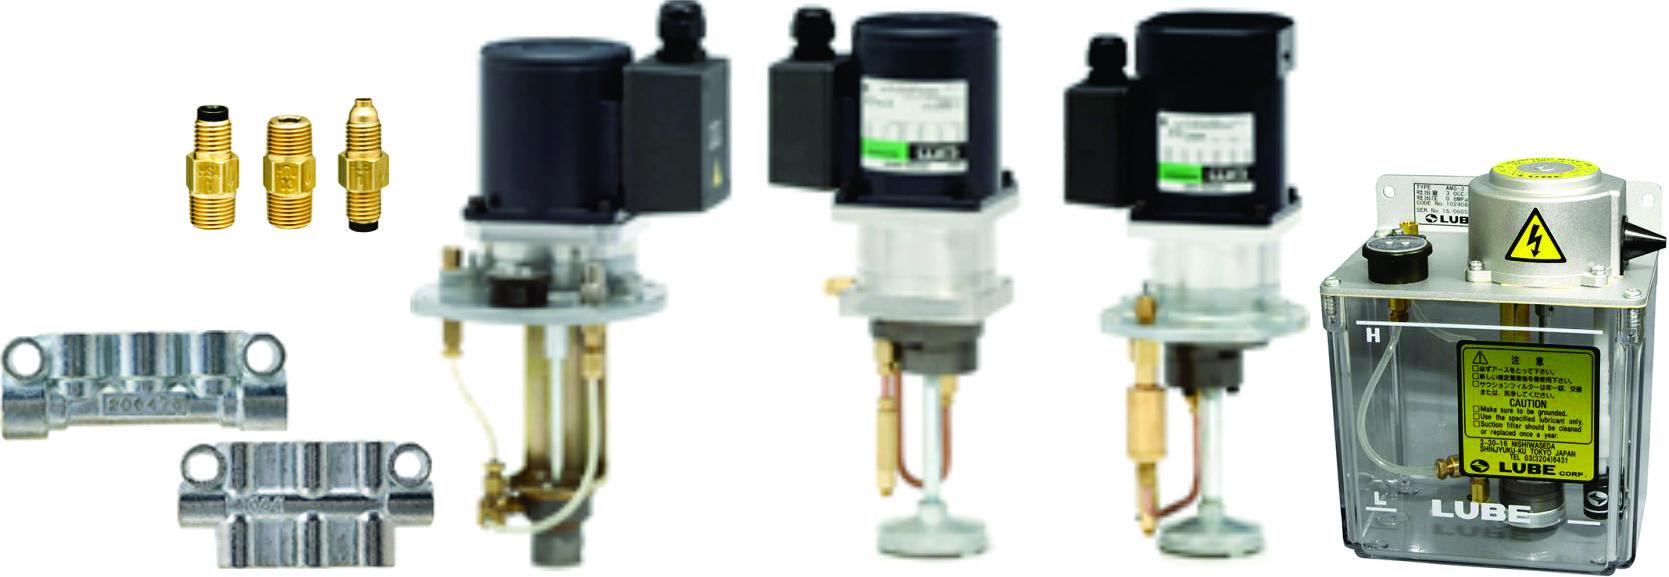 Continuous Single Line Resistance (SLR) System